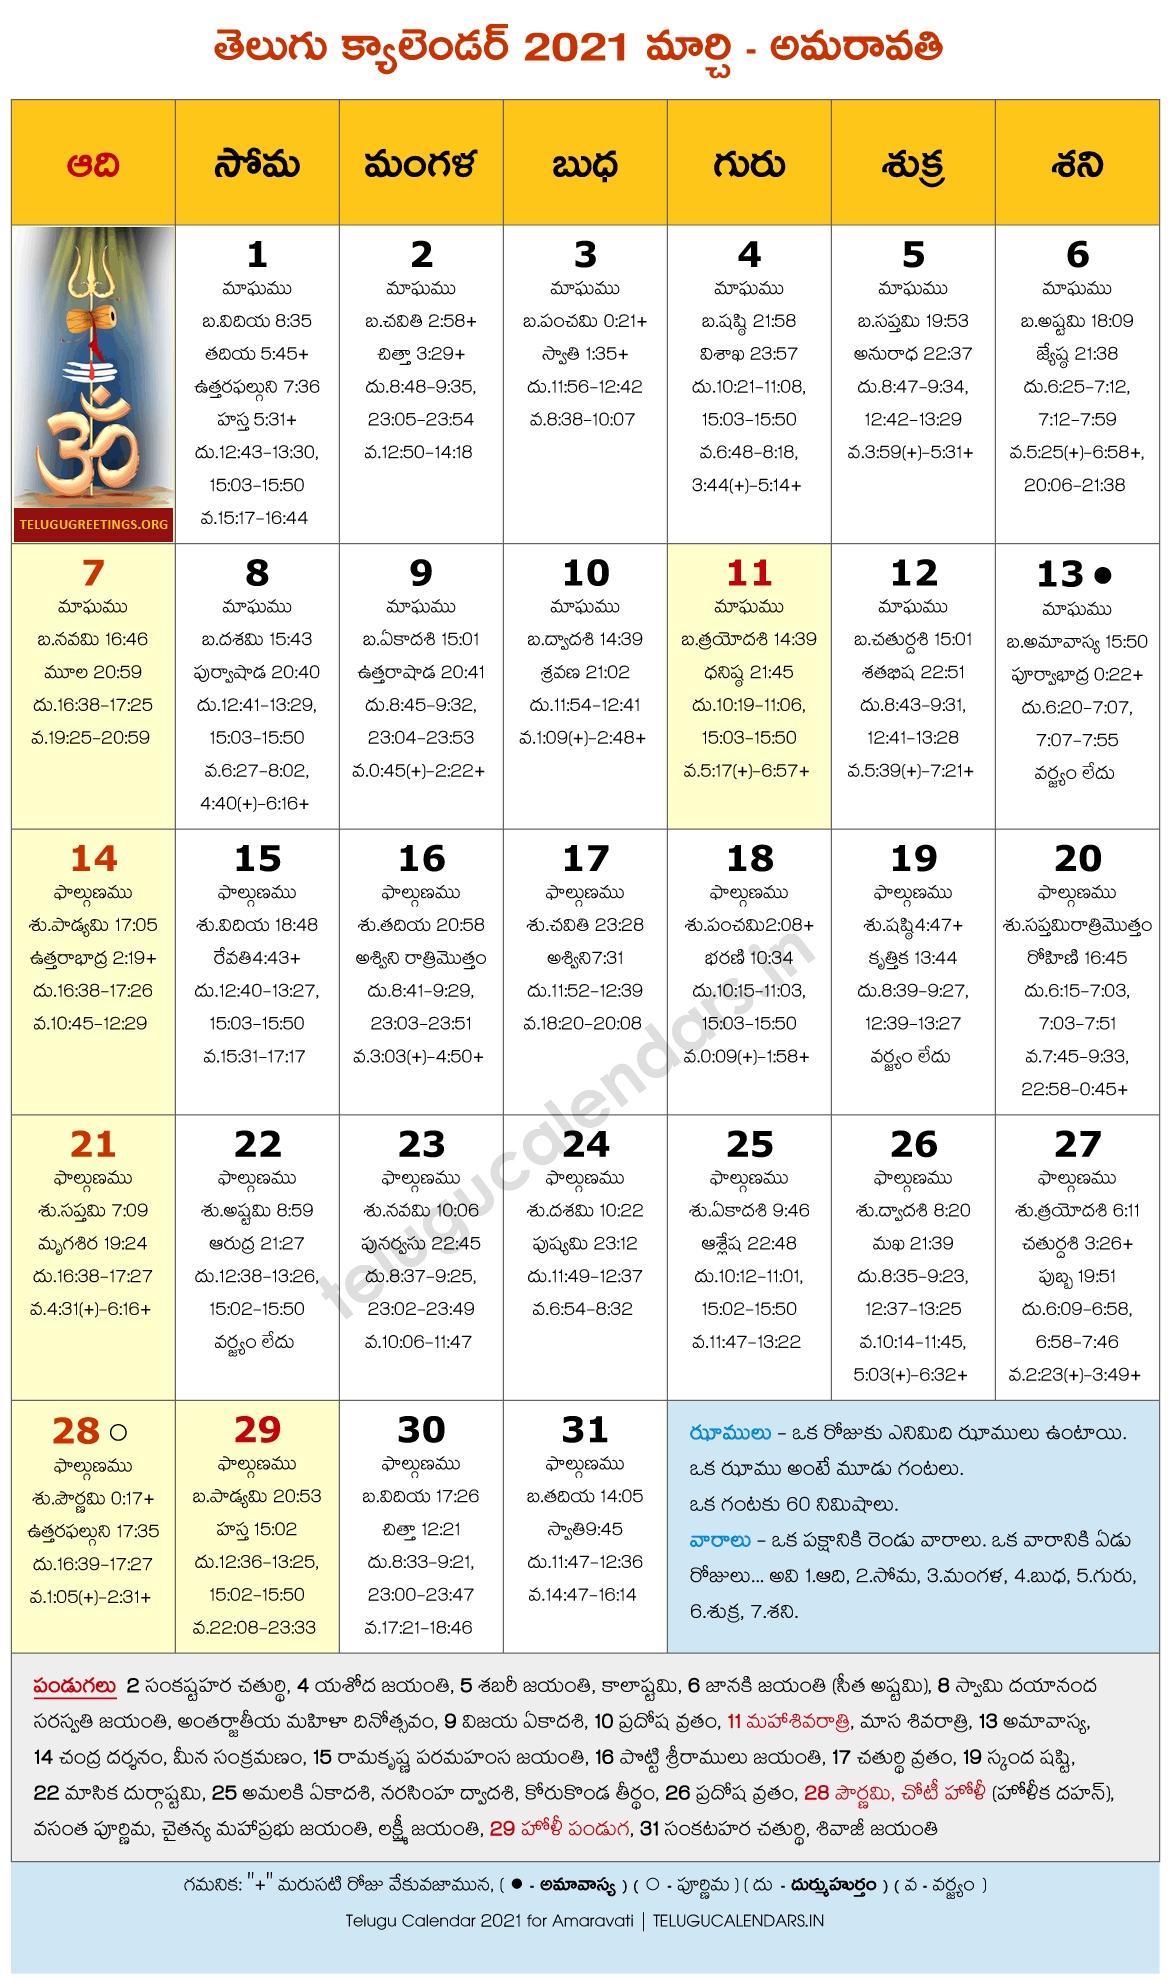 Amaravati 2021 March Telugu Calendar | Telugu Calendars Telugu Calendar 2021 October Andhra Pradesh